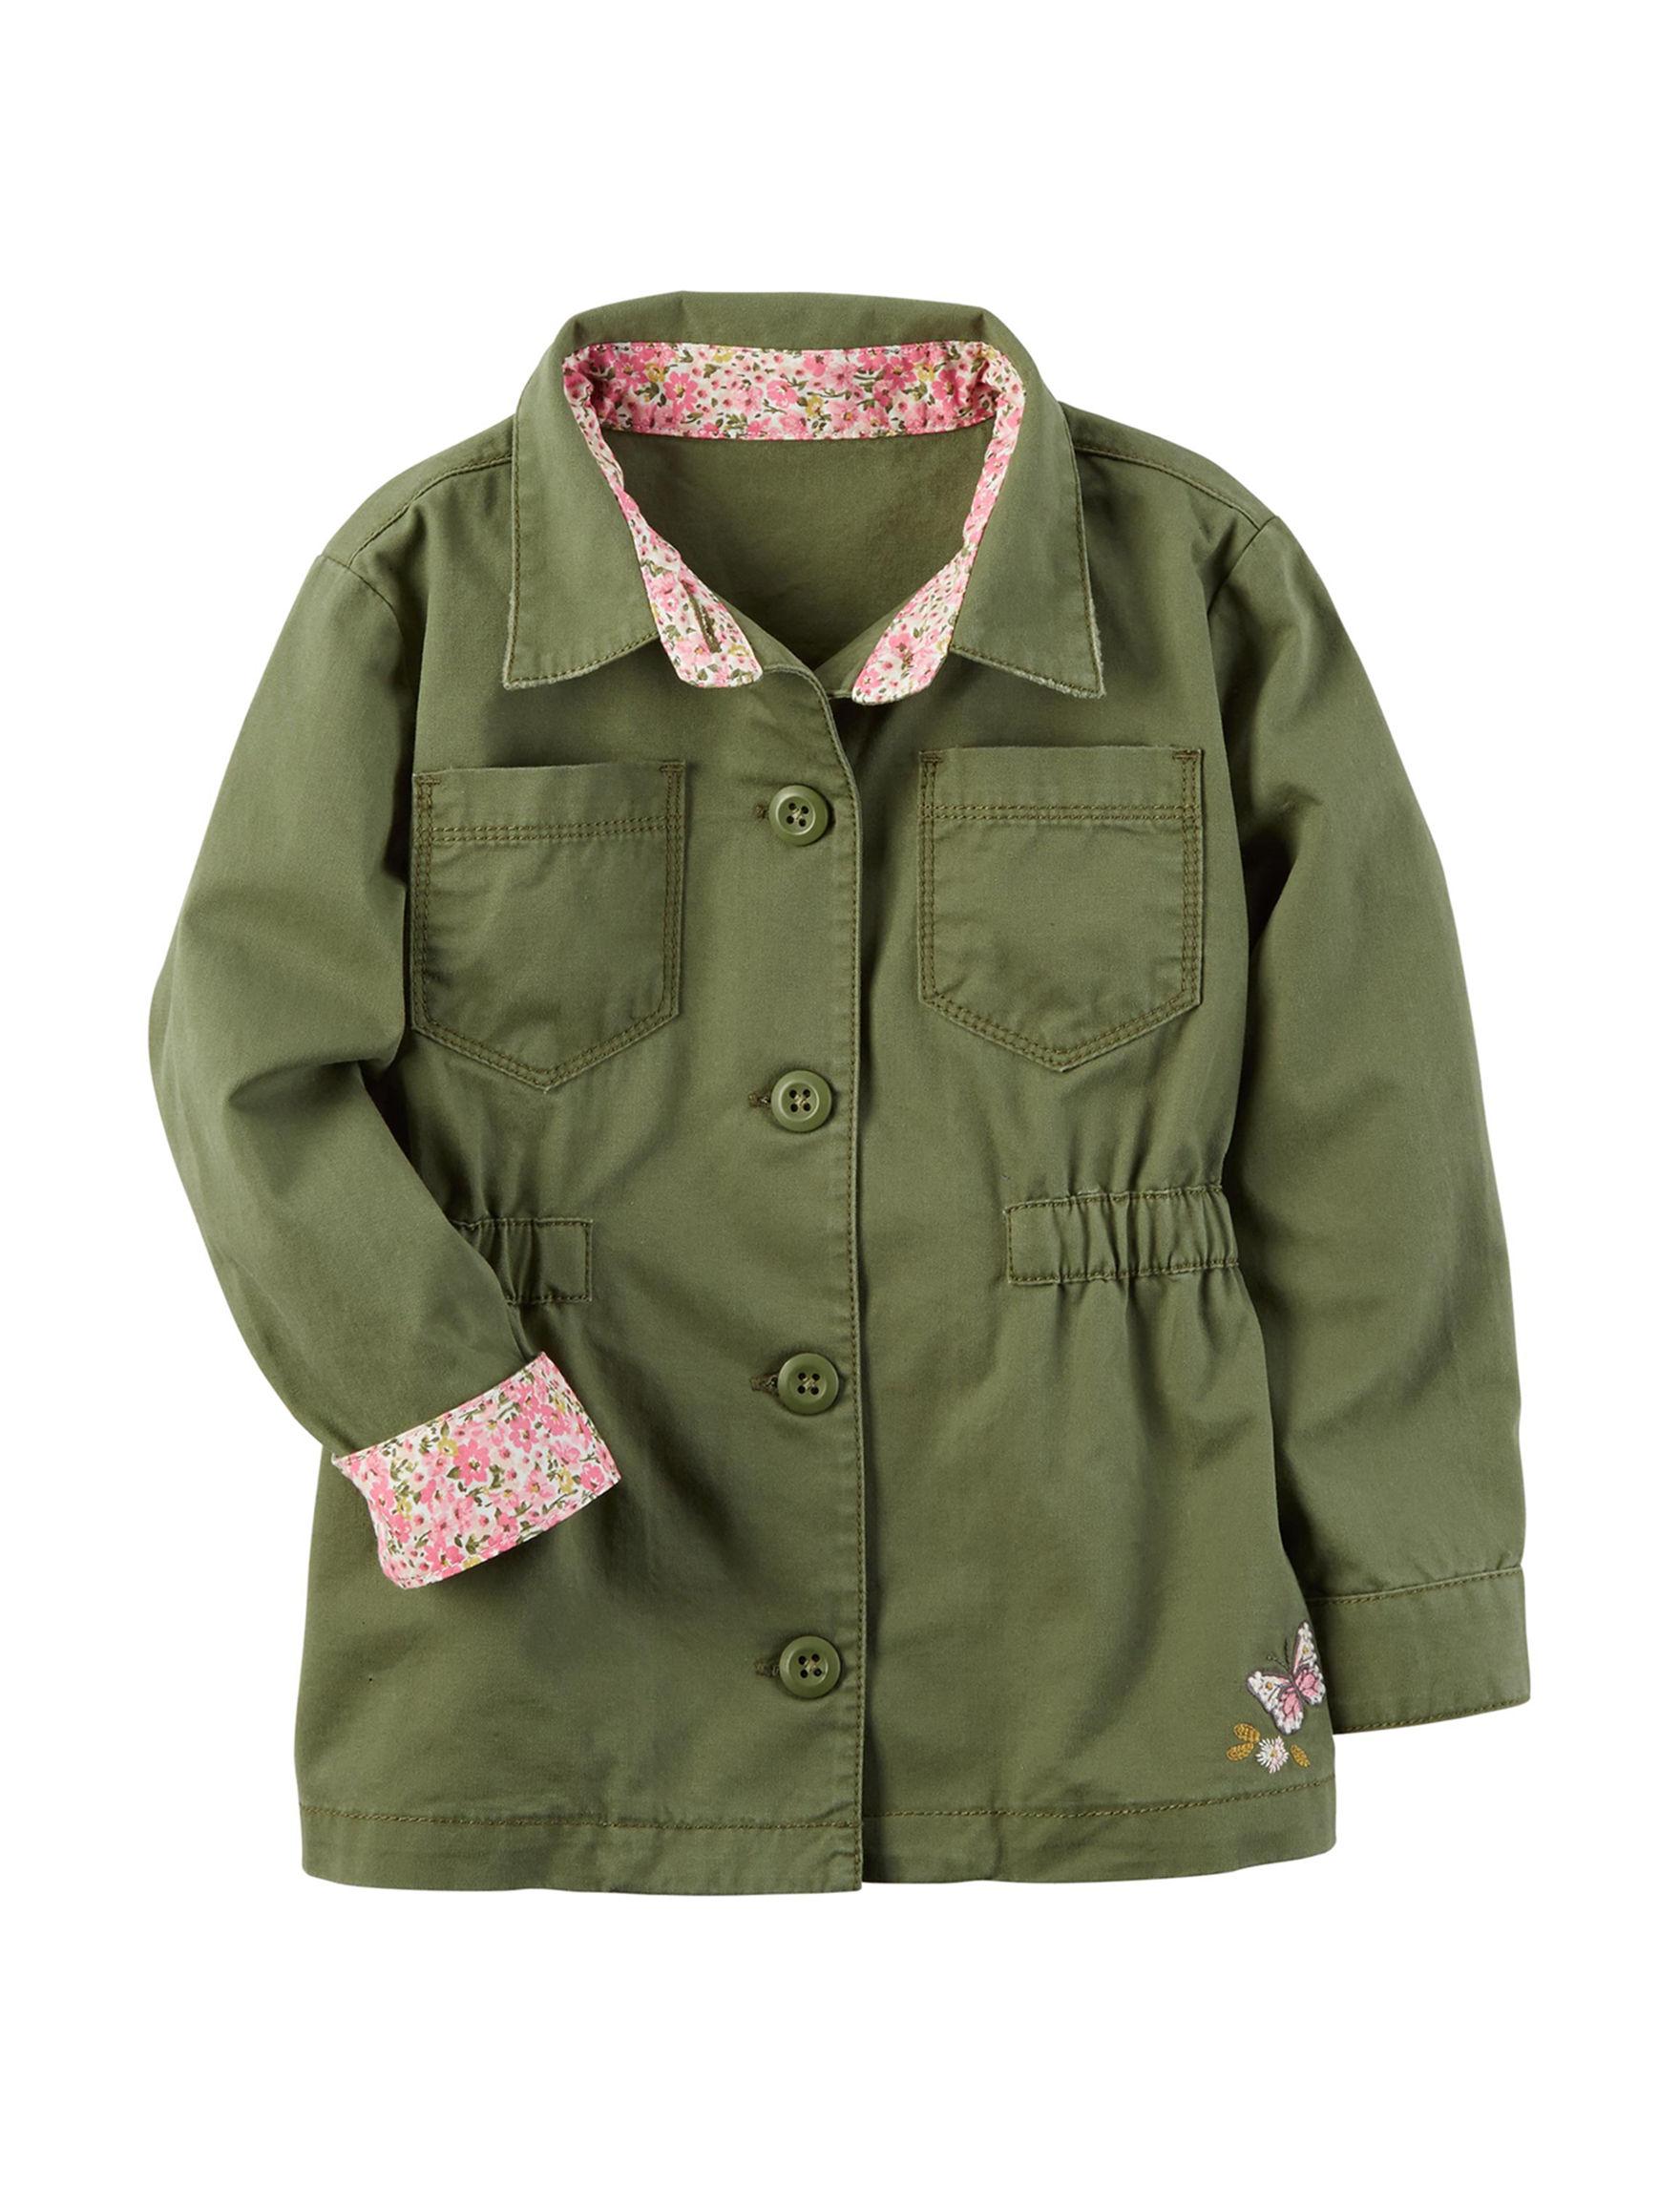 Carter's Olive Fleece & Soft Shell Jackets